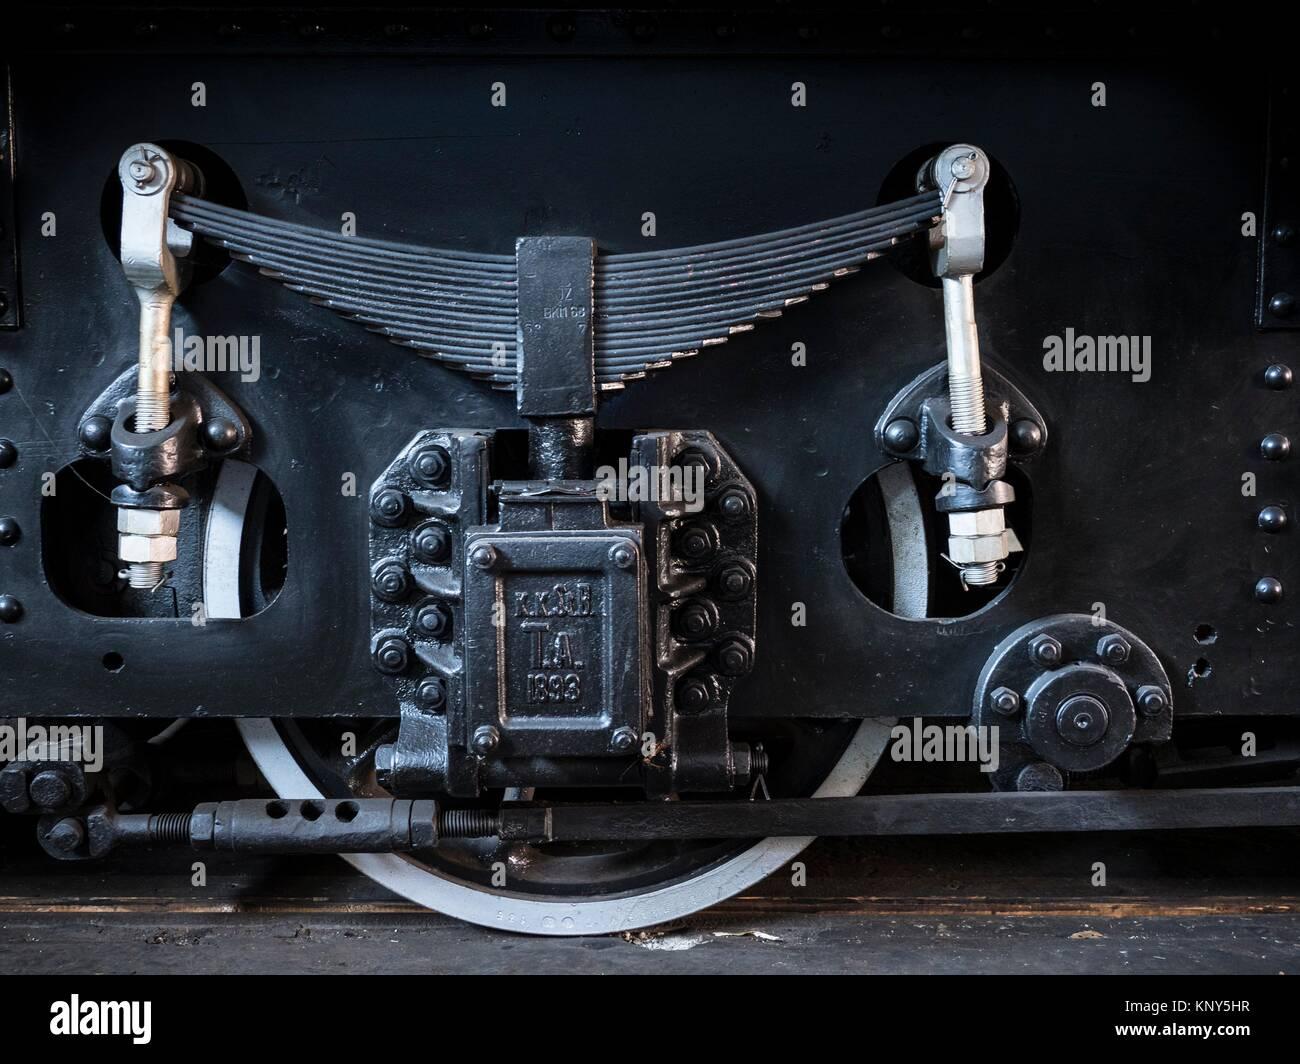 Slovenia Ljubljana Train Museum Locomotive Wheels Closeup. - Stock Image